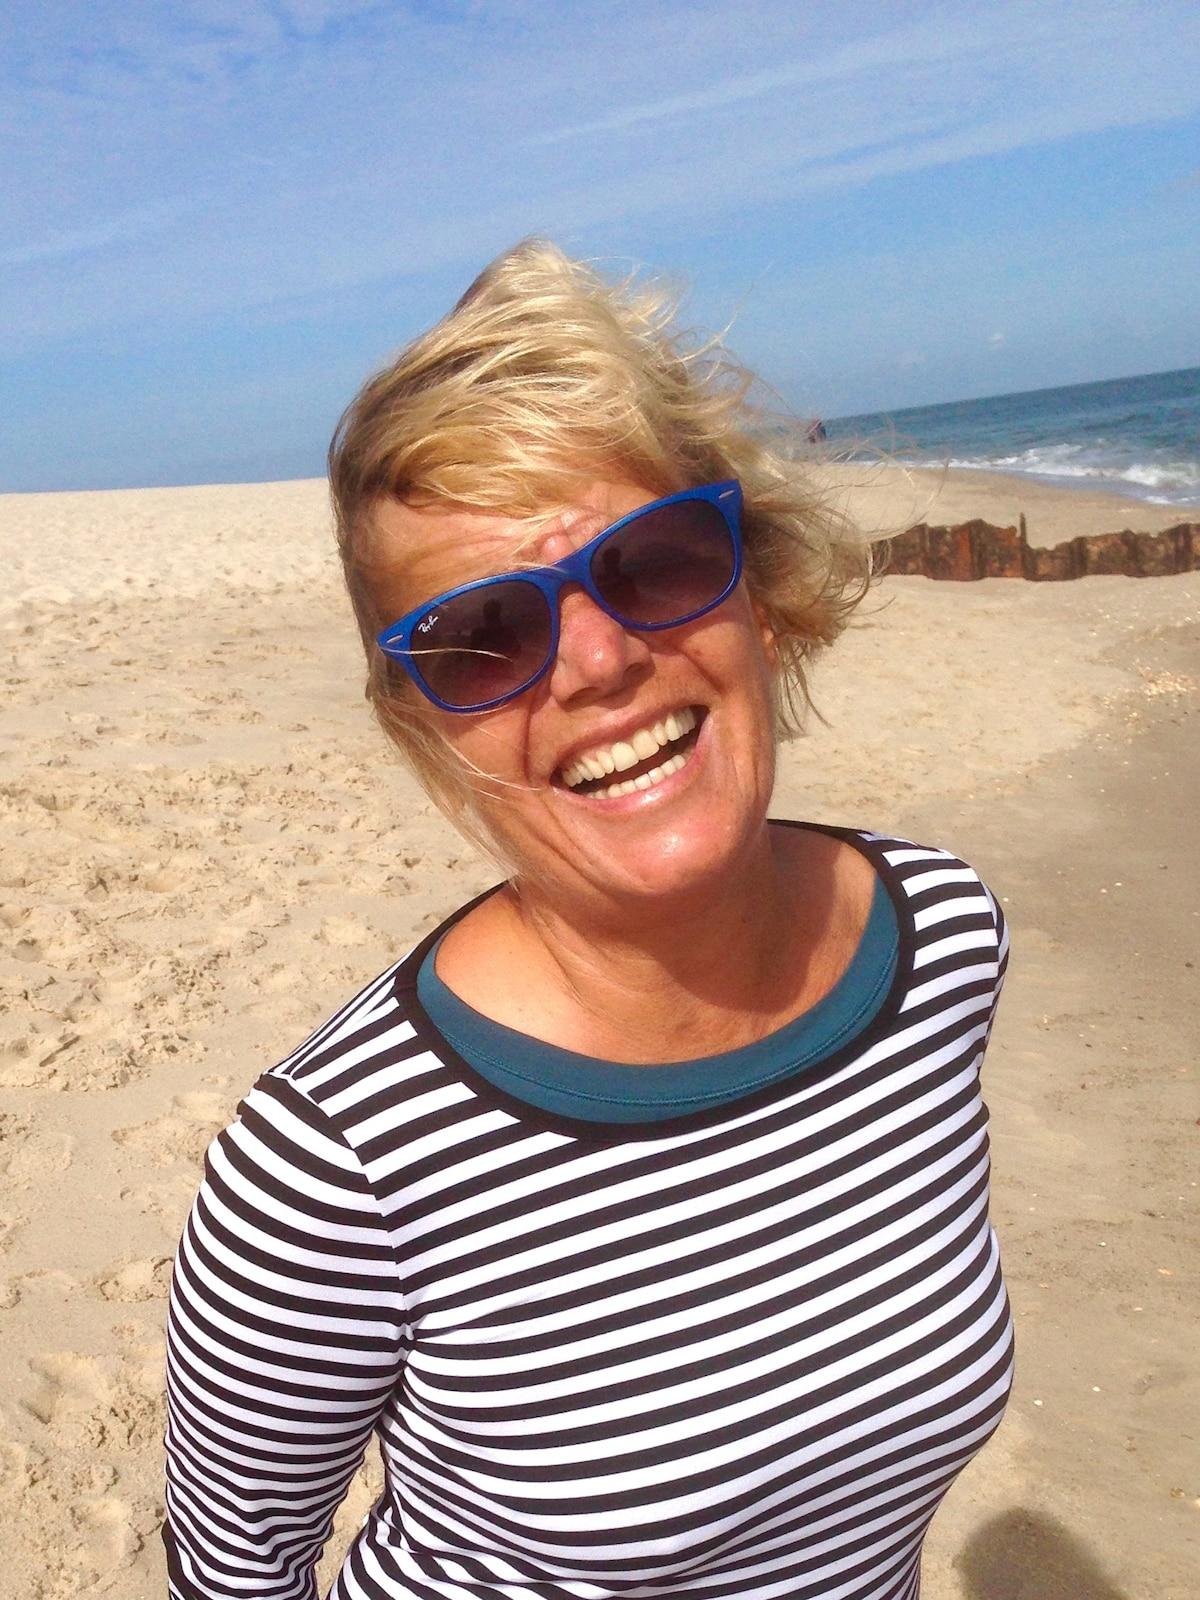 Sigrid From Hamburg, Germany